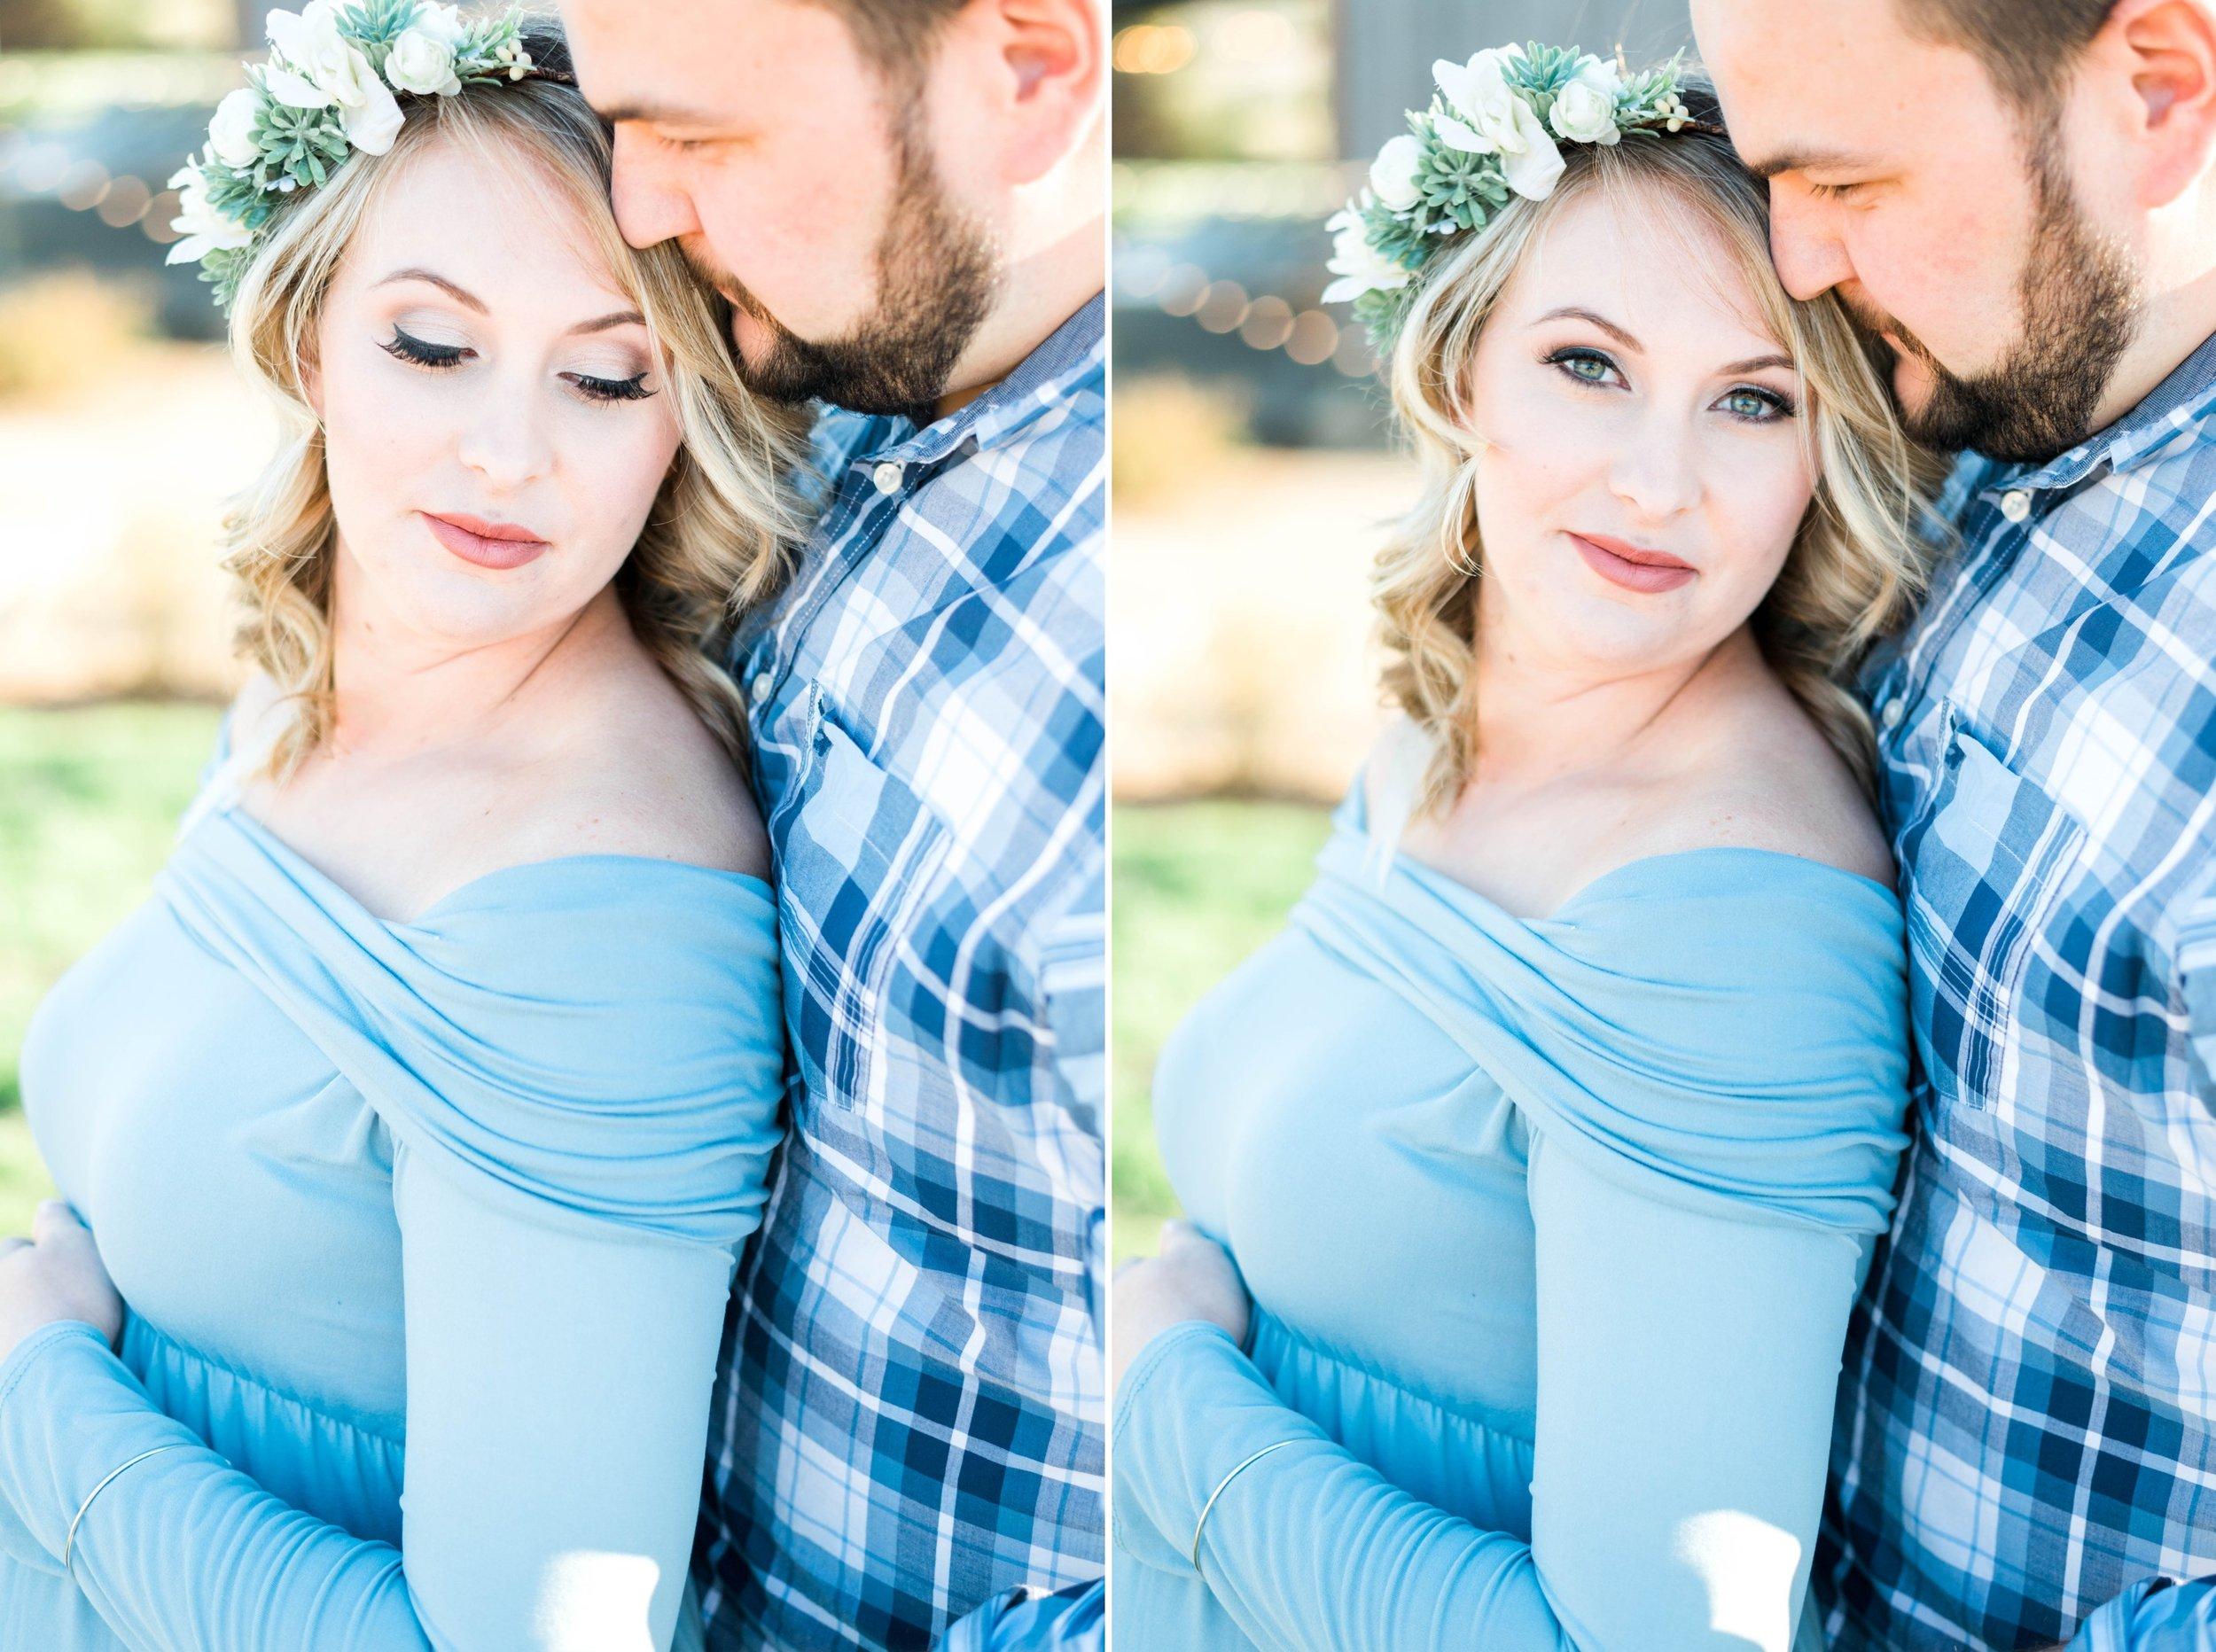 SorellaFarms_Jessica+Dylan_MaternitySession_Virginiaweddingphotographer 19.jpg